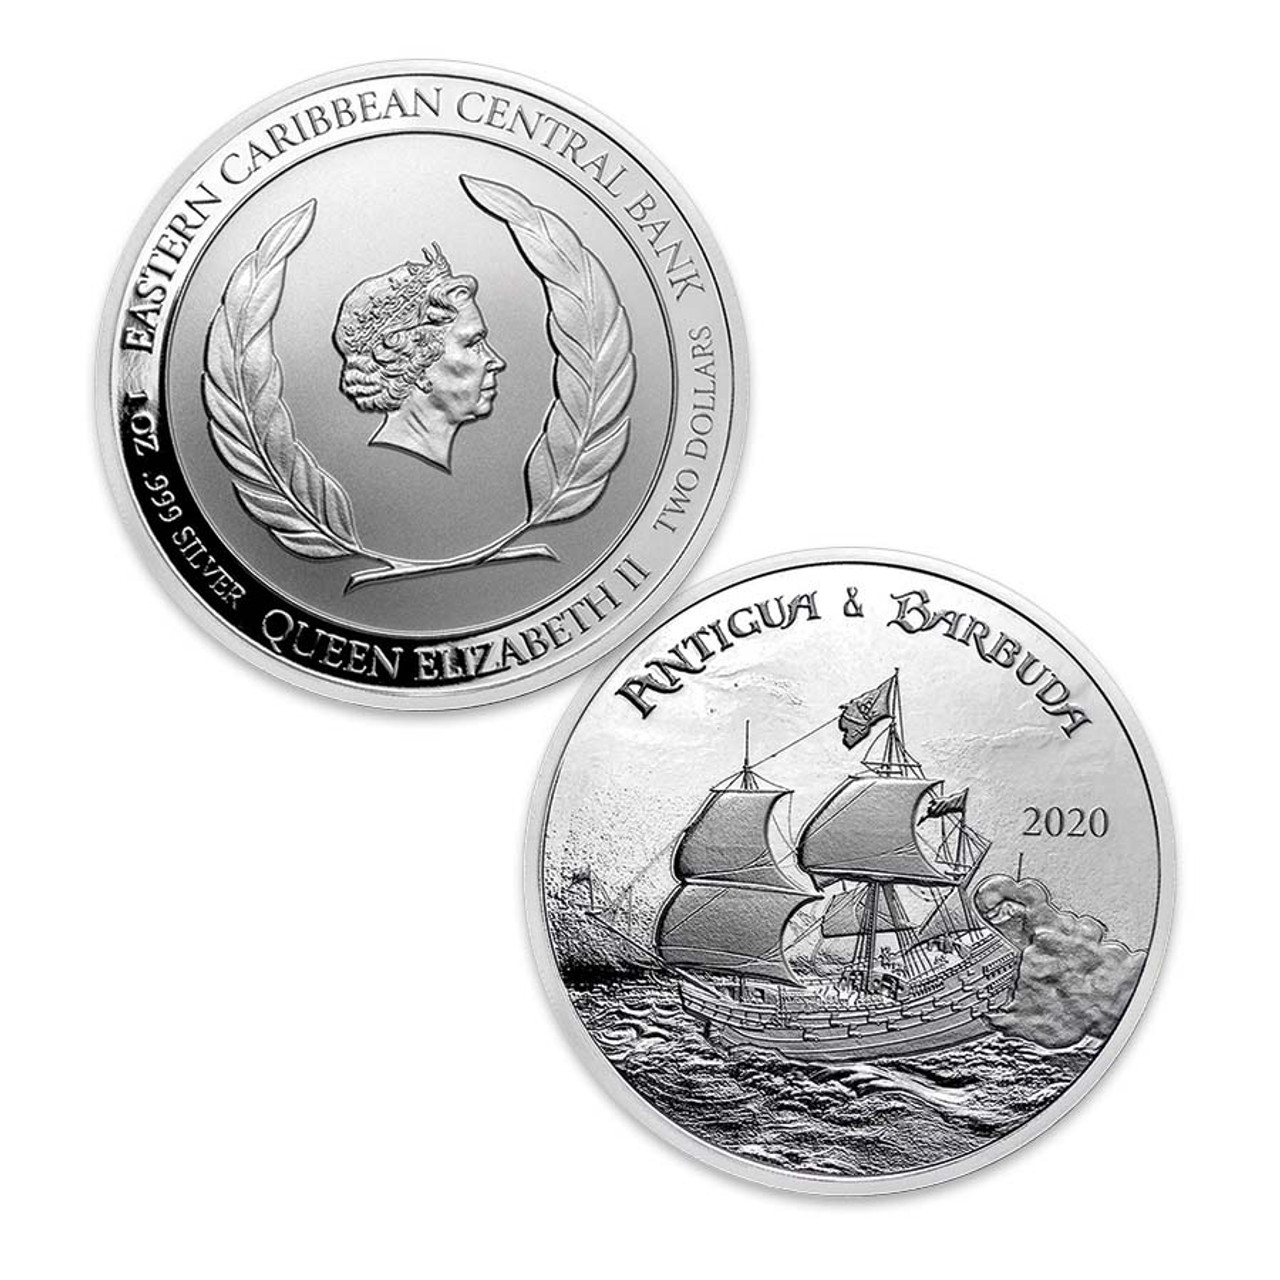 Antigua & Barbuda 2020 Rum Runner 1-Oz. Silver Brilliant Uncirculated